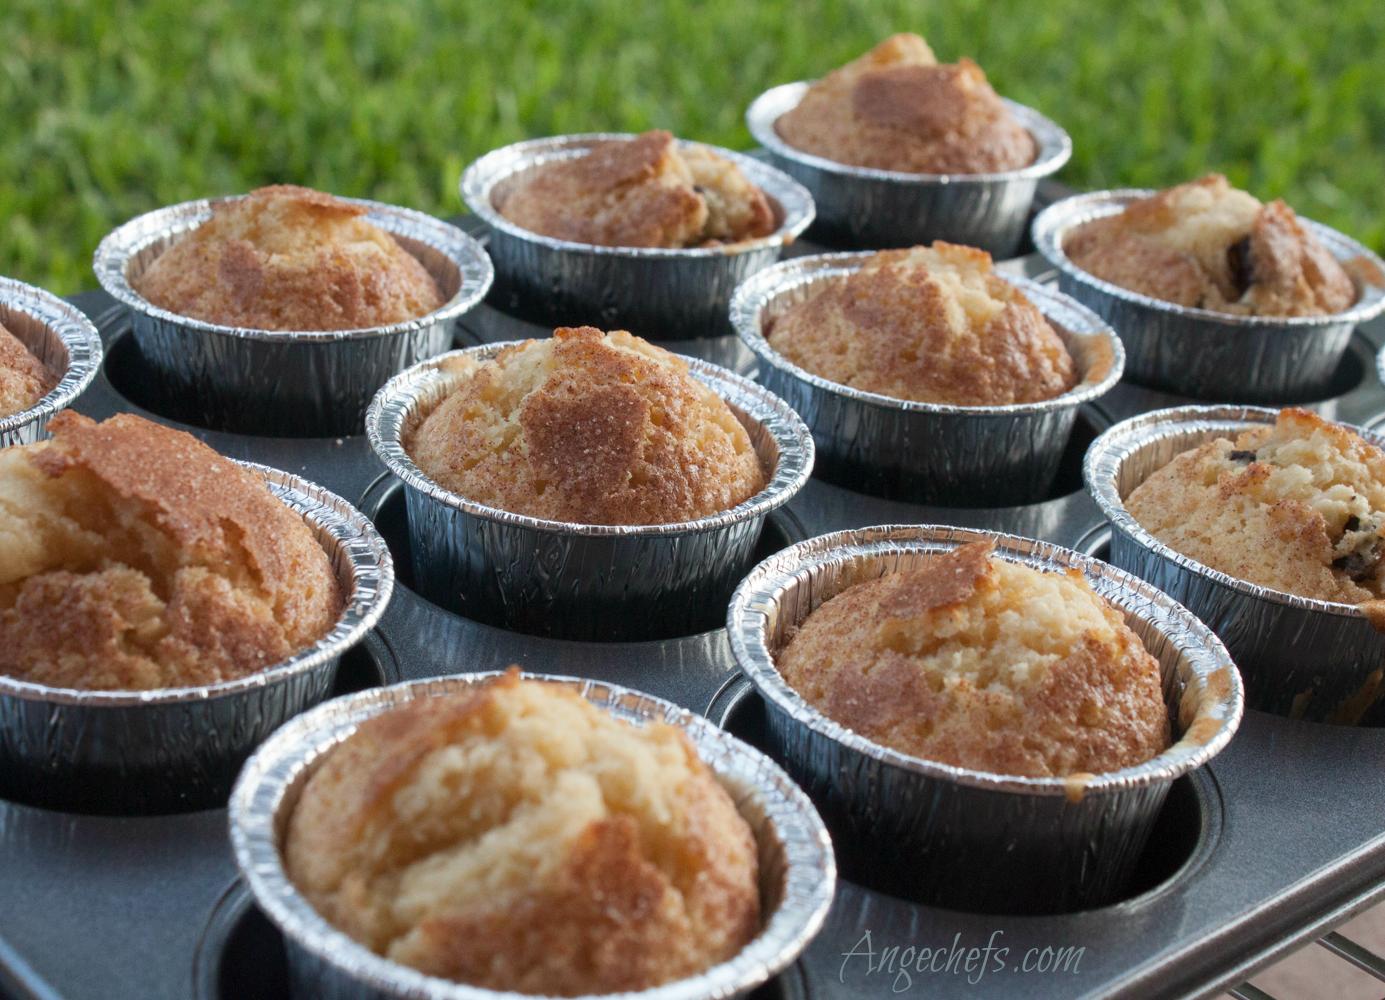 Muffins con Chocolate y Canela!-4 angechefs.com(MA)